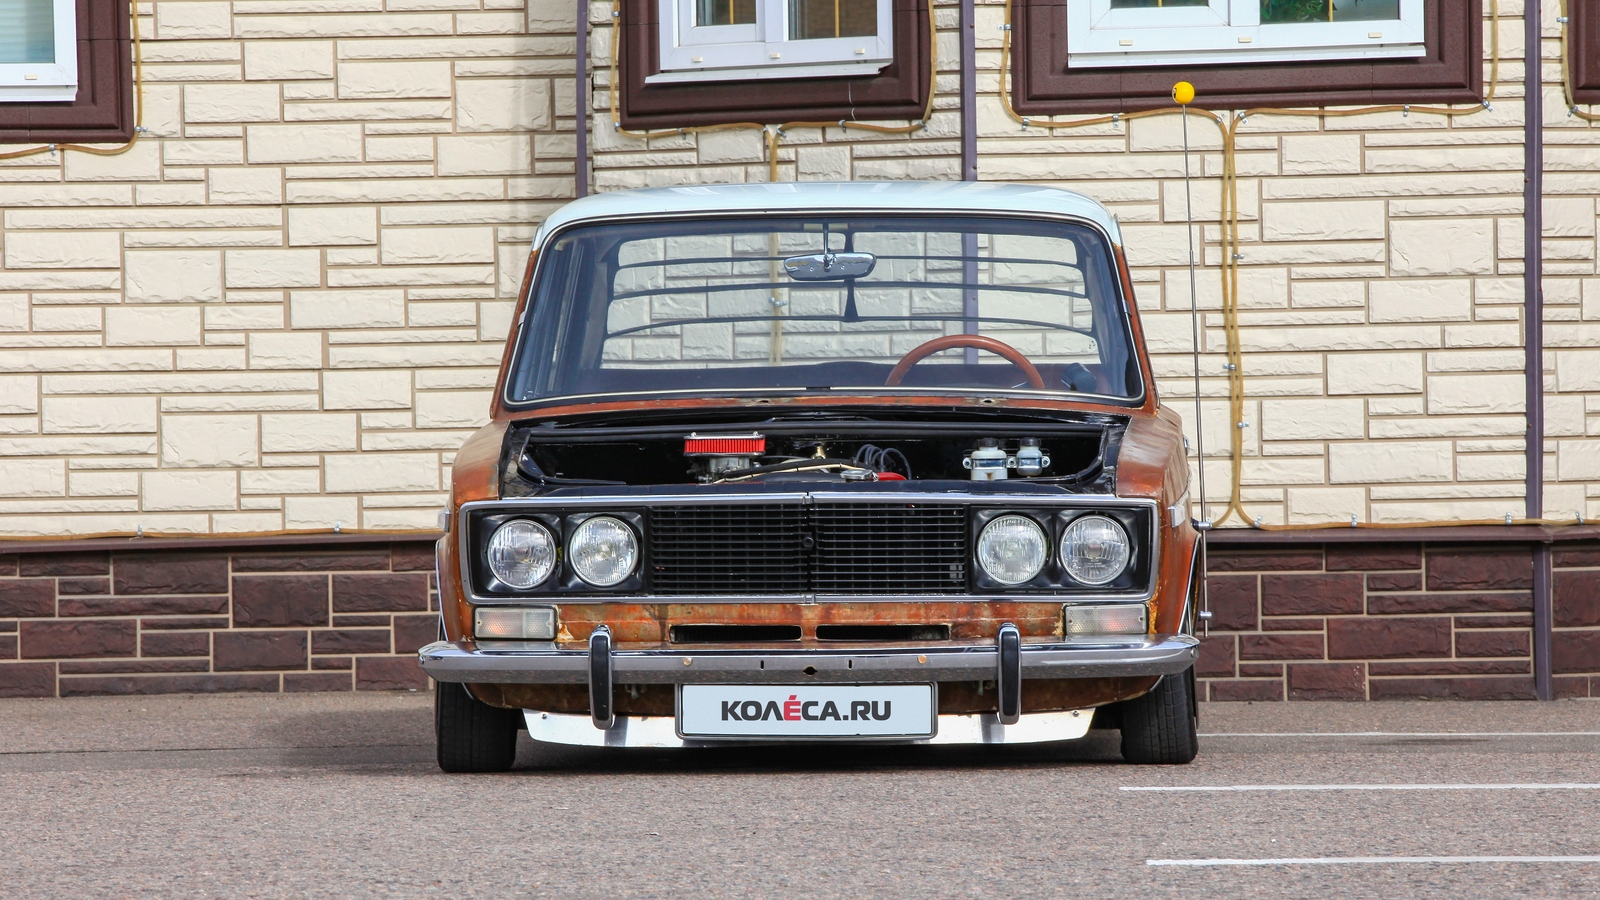 Тюнинг ВАЗ-2106 в стиле Ratlook - Колеса.ру